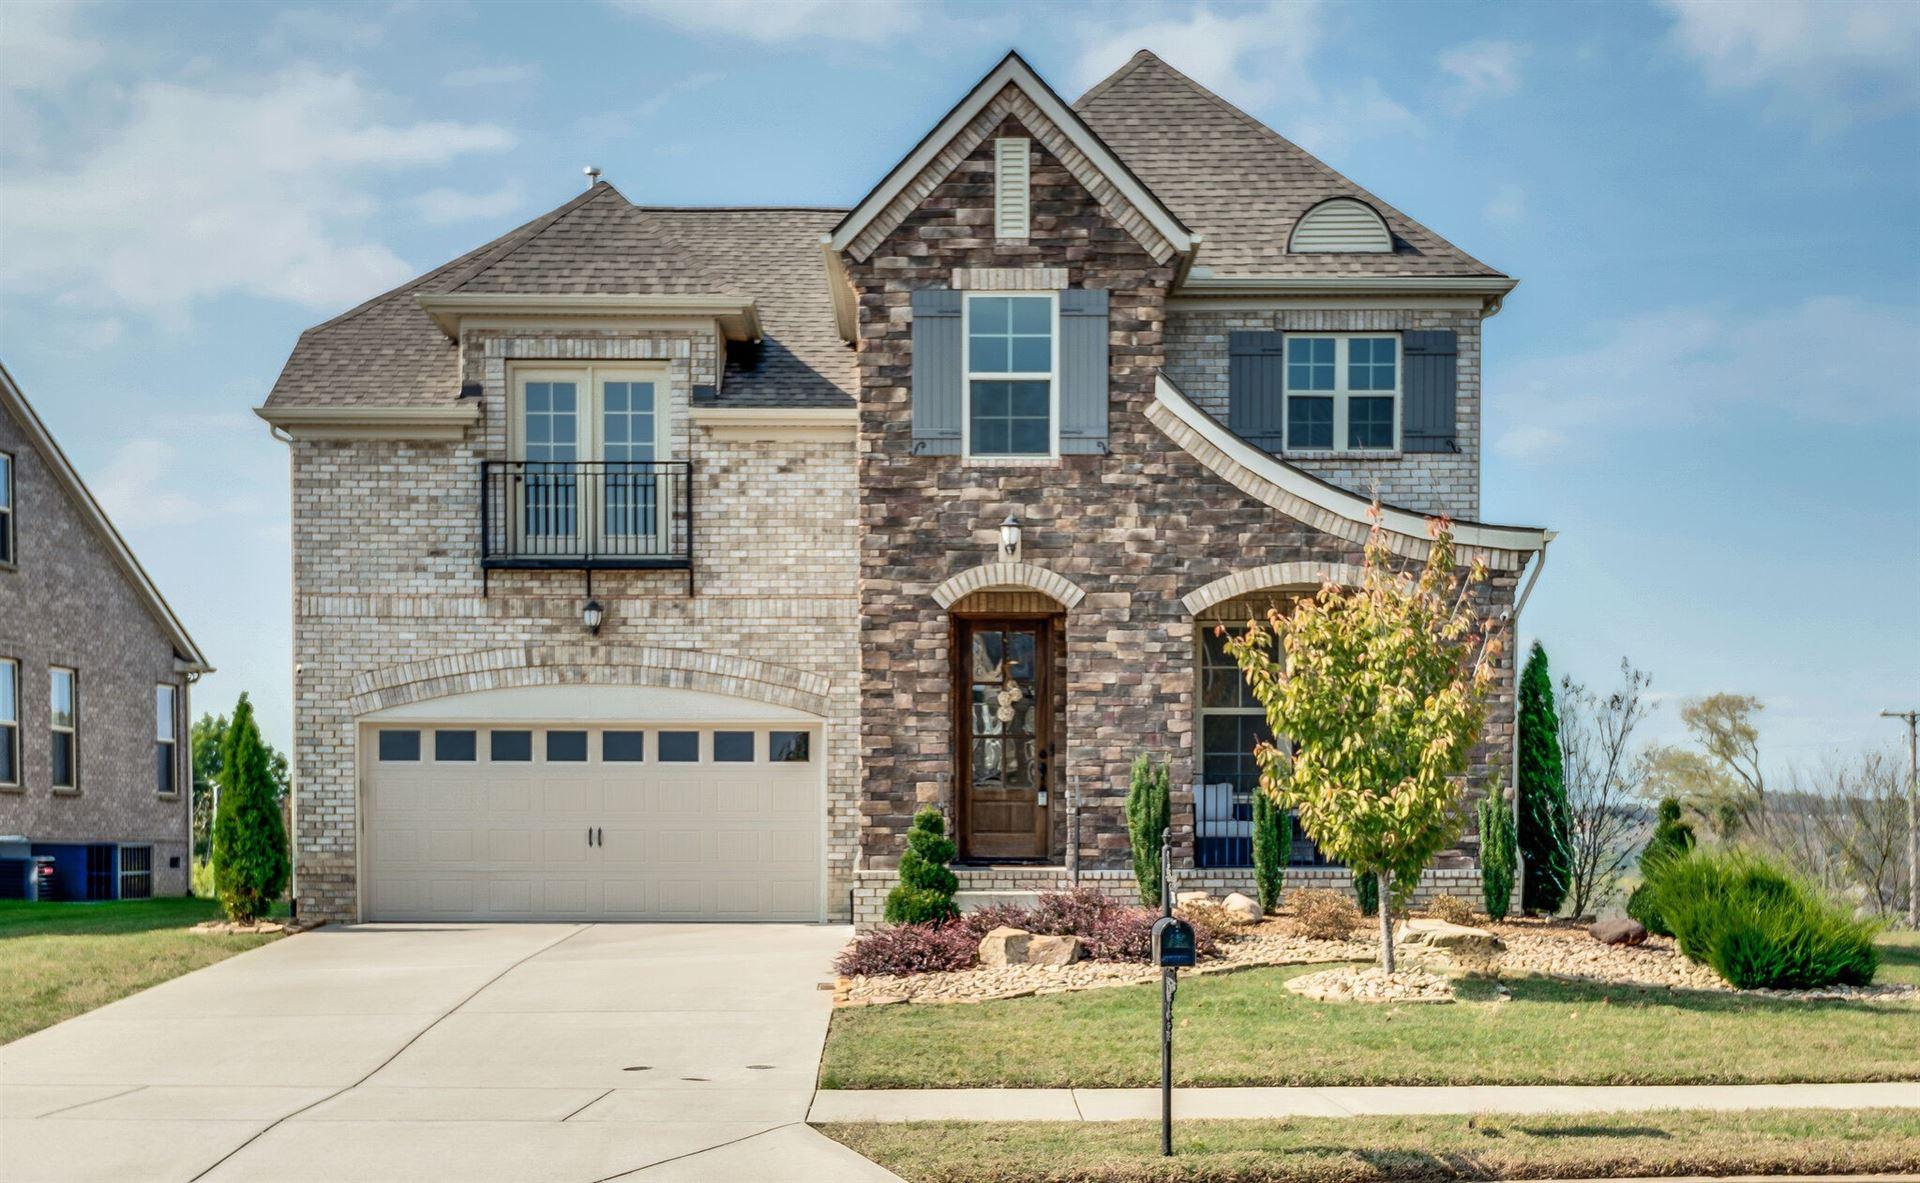 306 Old Stone Rd, Goodlettsville, TN 37072 - MLS#: 2207485